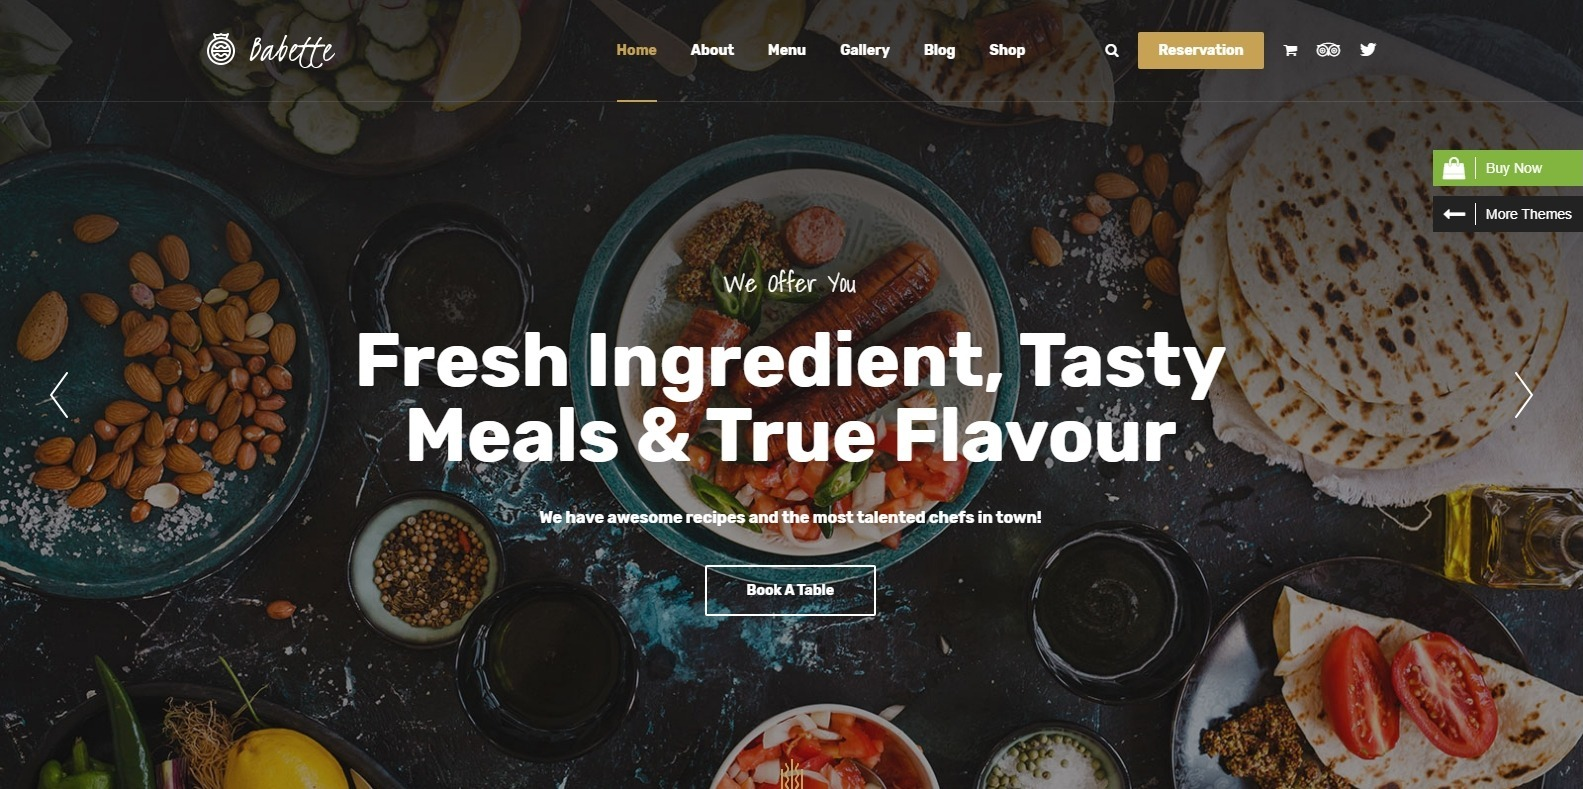 babette-coffee-shop-website-template